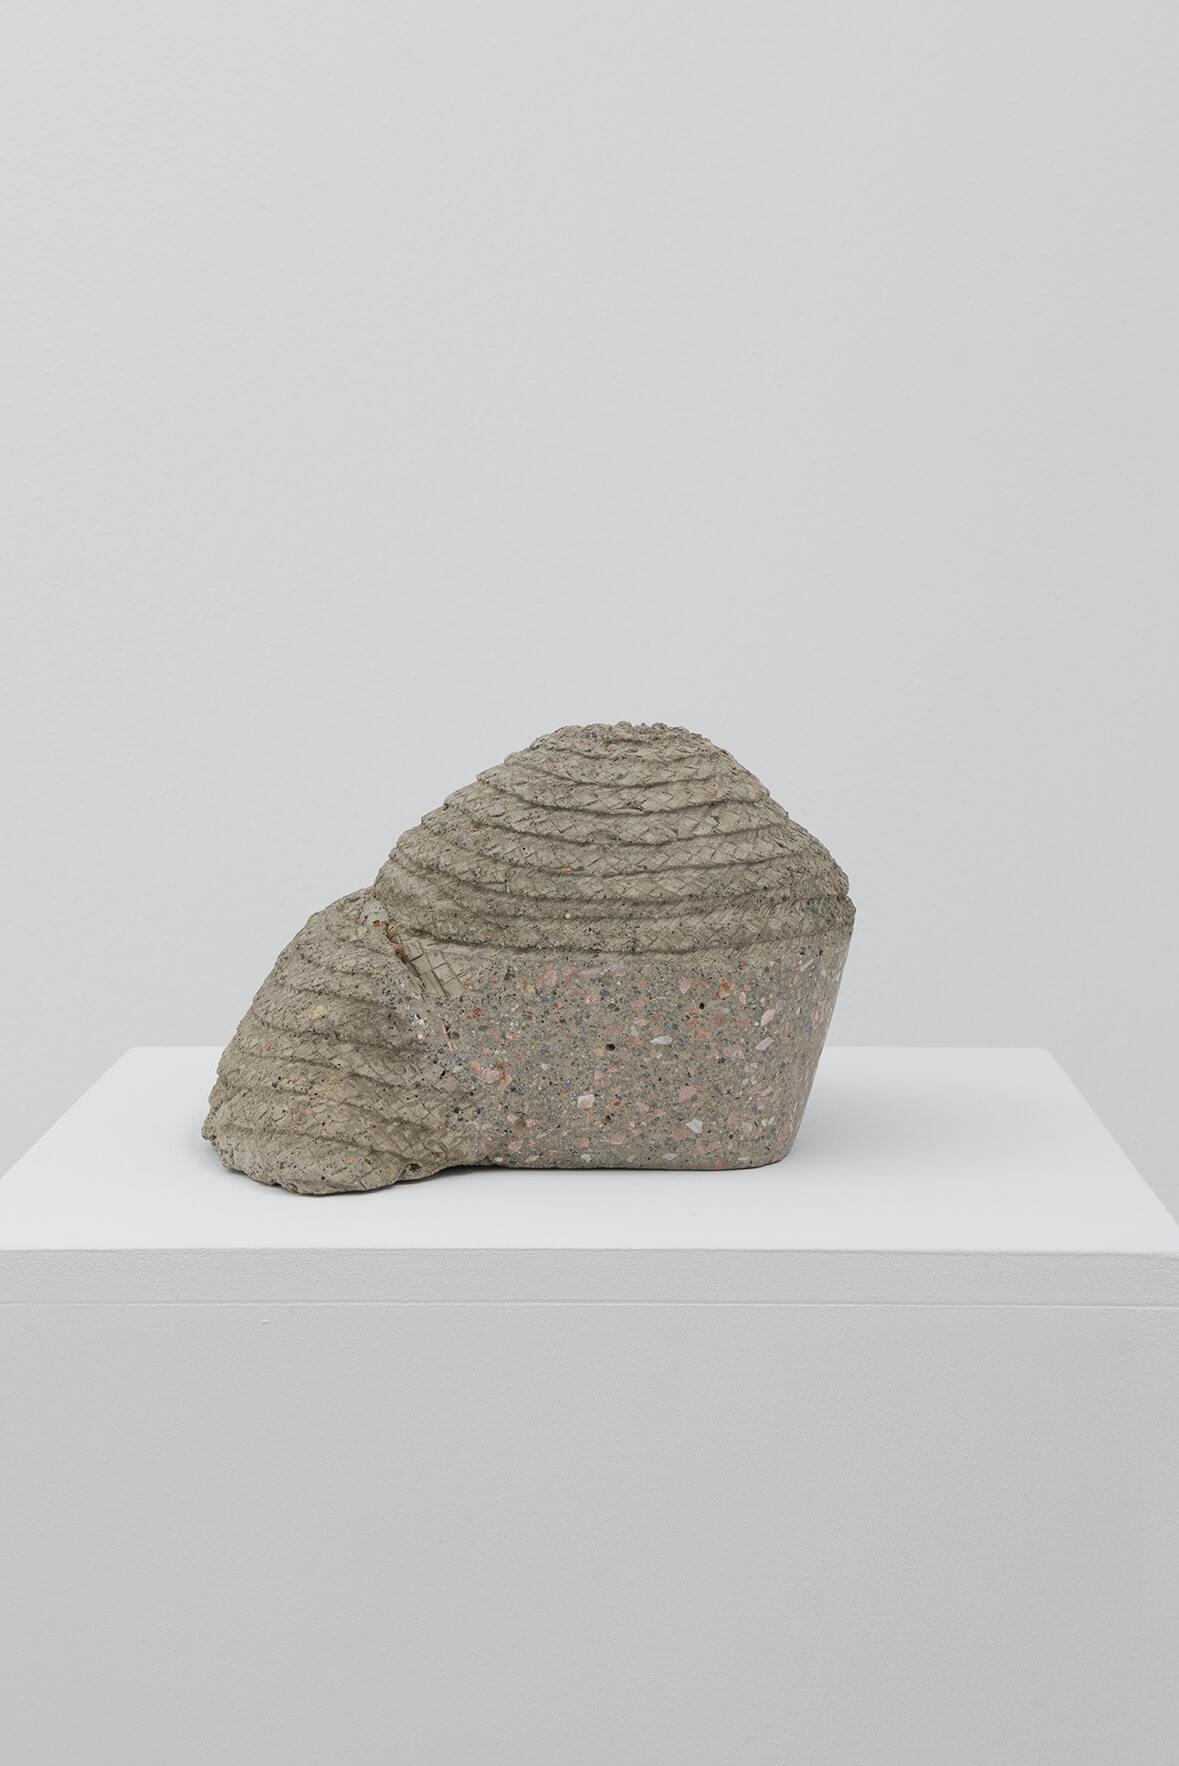 Stilfragen (crania), 2016 | Concavitat | ProjecteSD